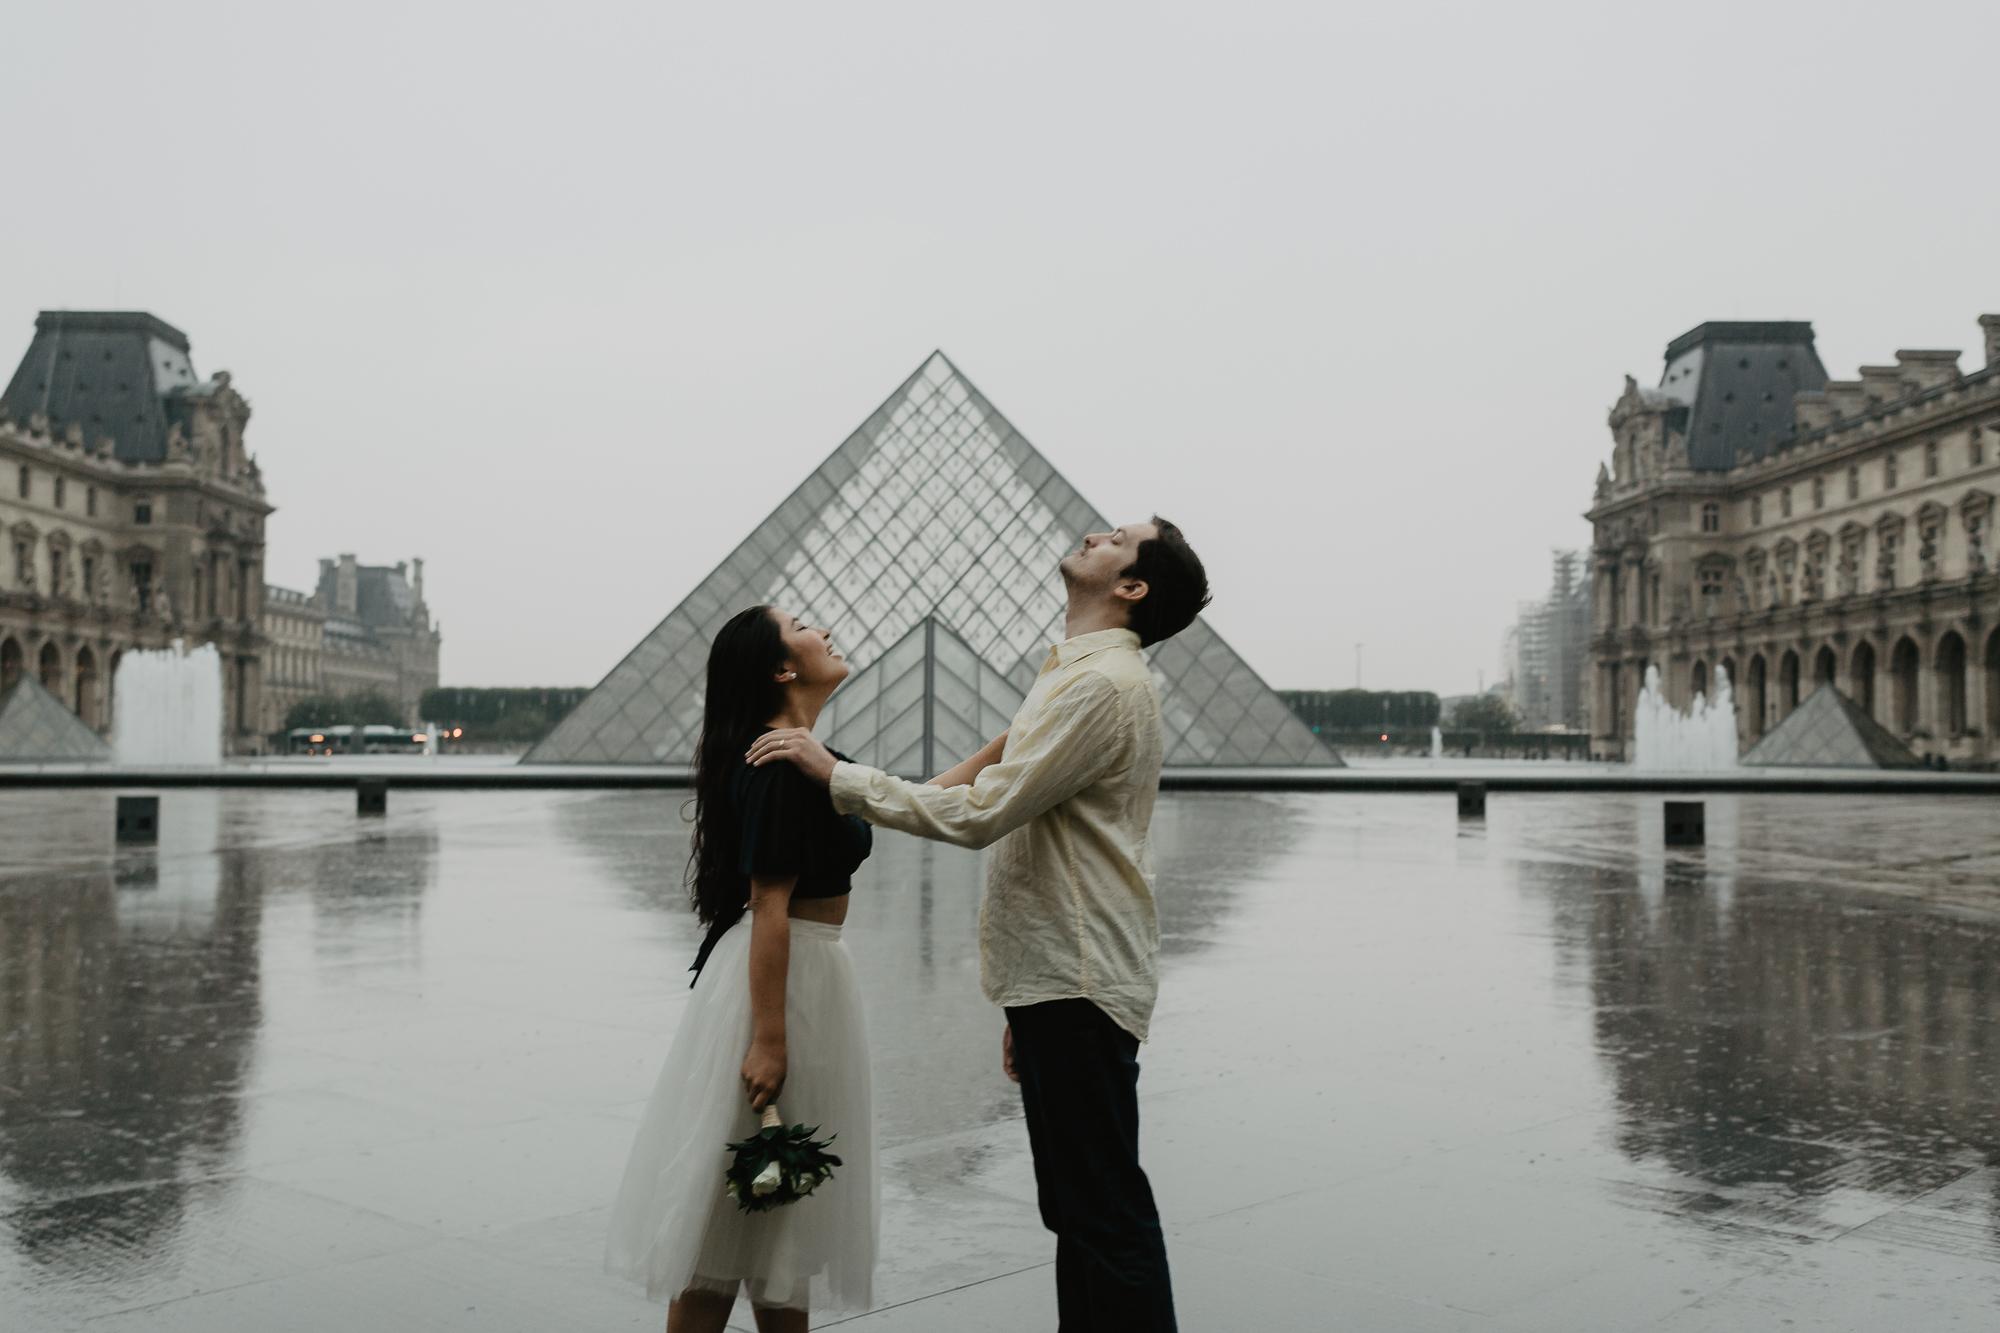 Couple under the rain Pyramid Louvre Museum Paris Photography